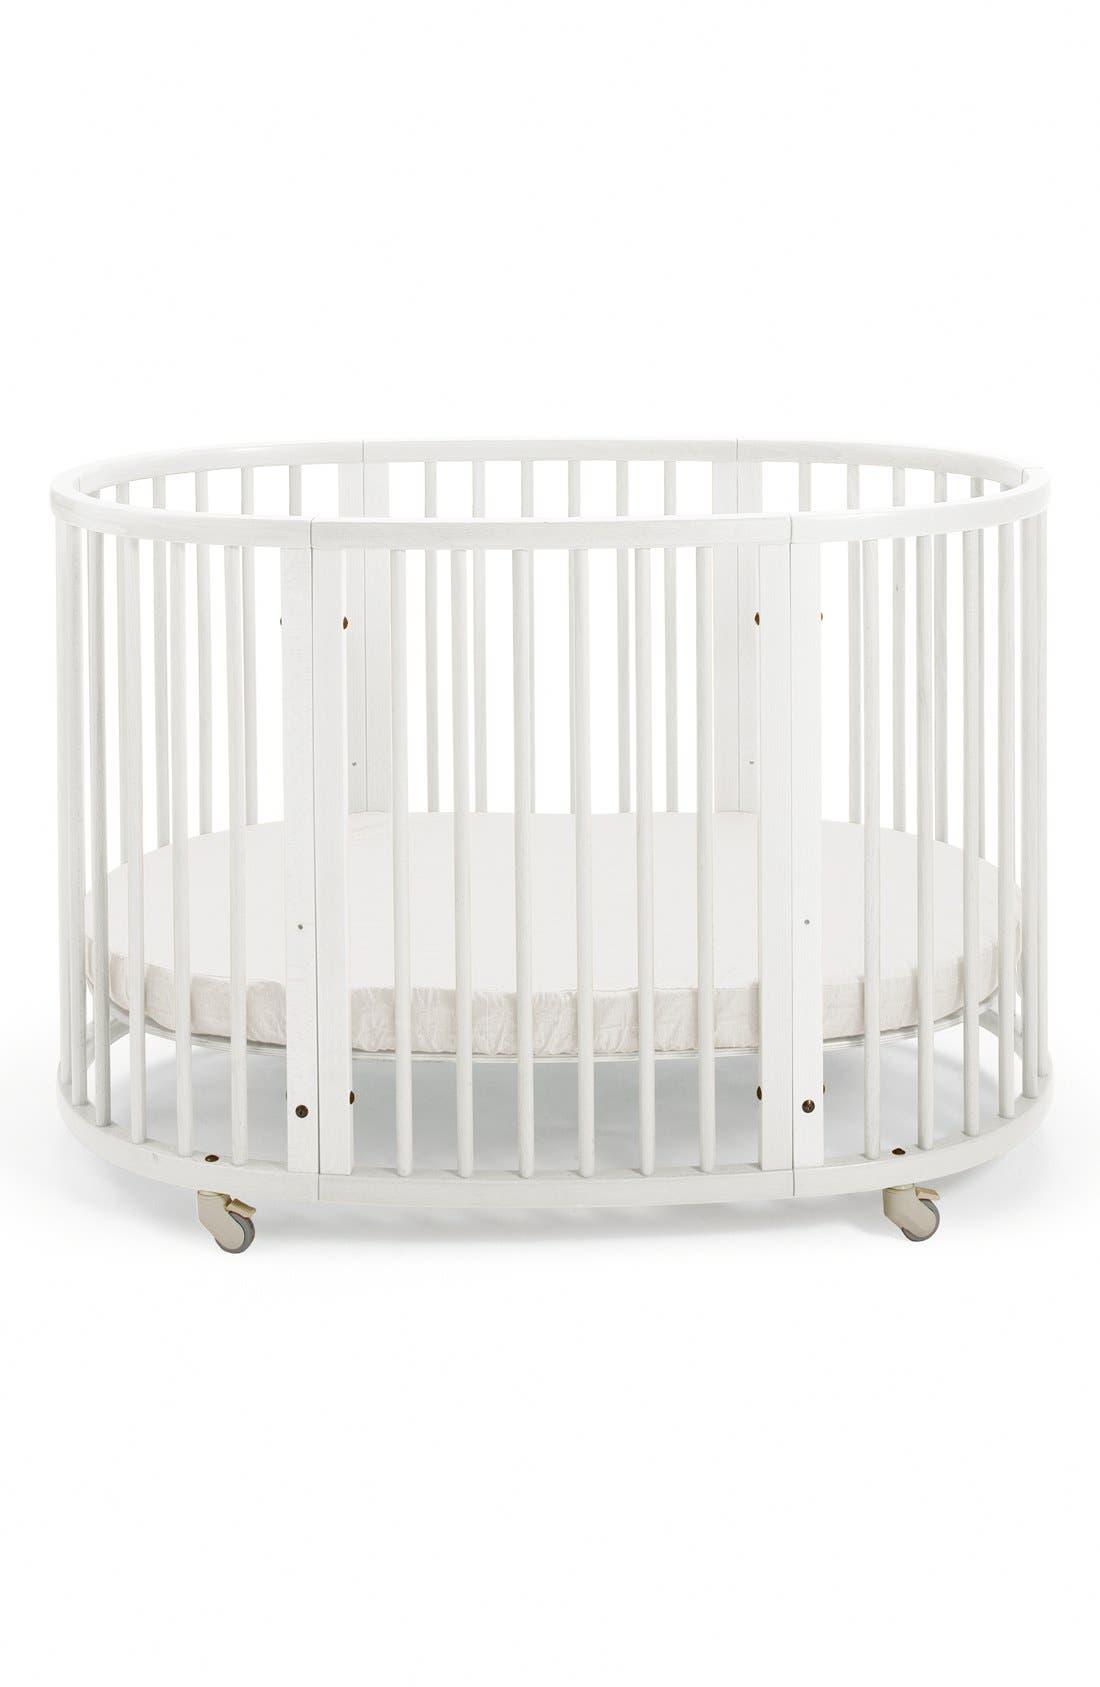 Stokke Infant Stokke Convertible Sleepi Crib & Toddler Bed, Size One Size - White